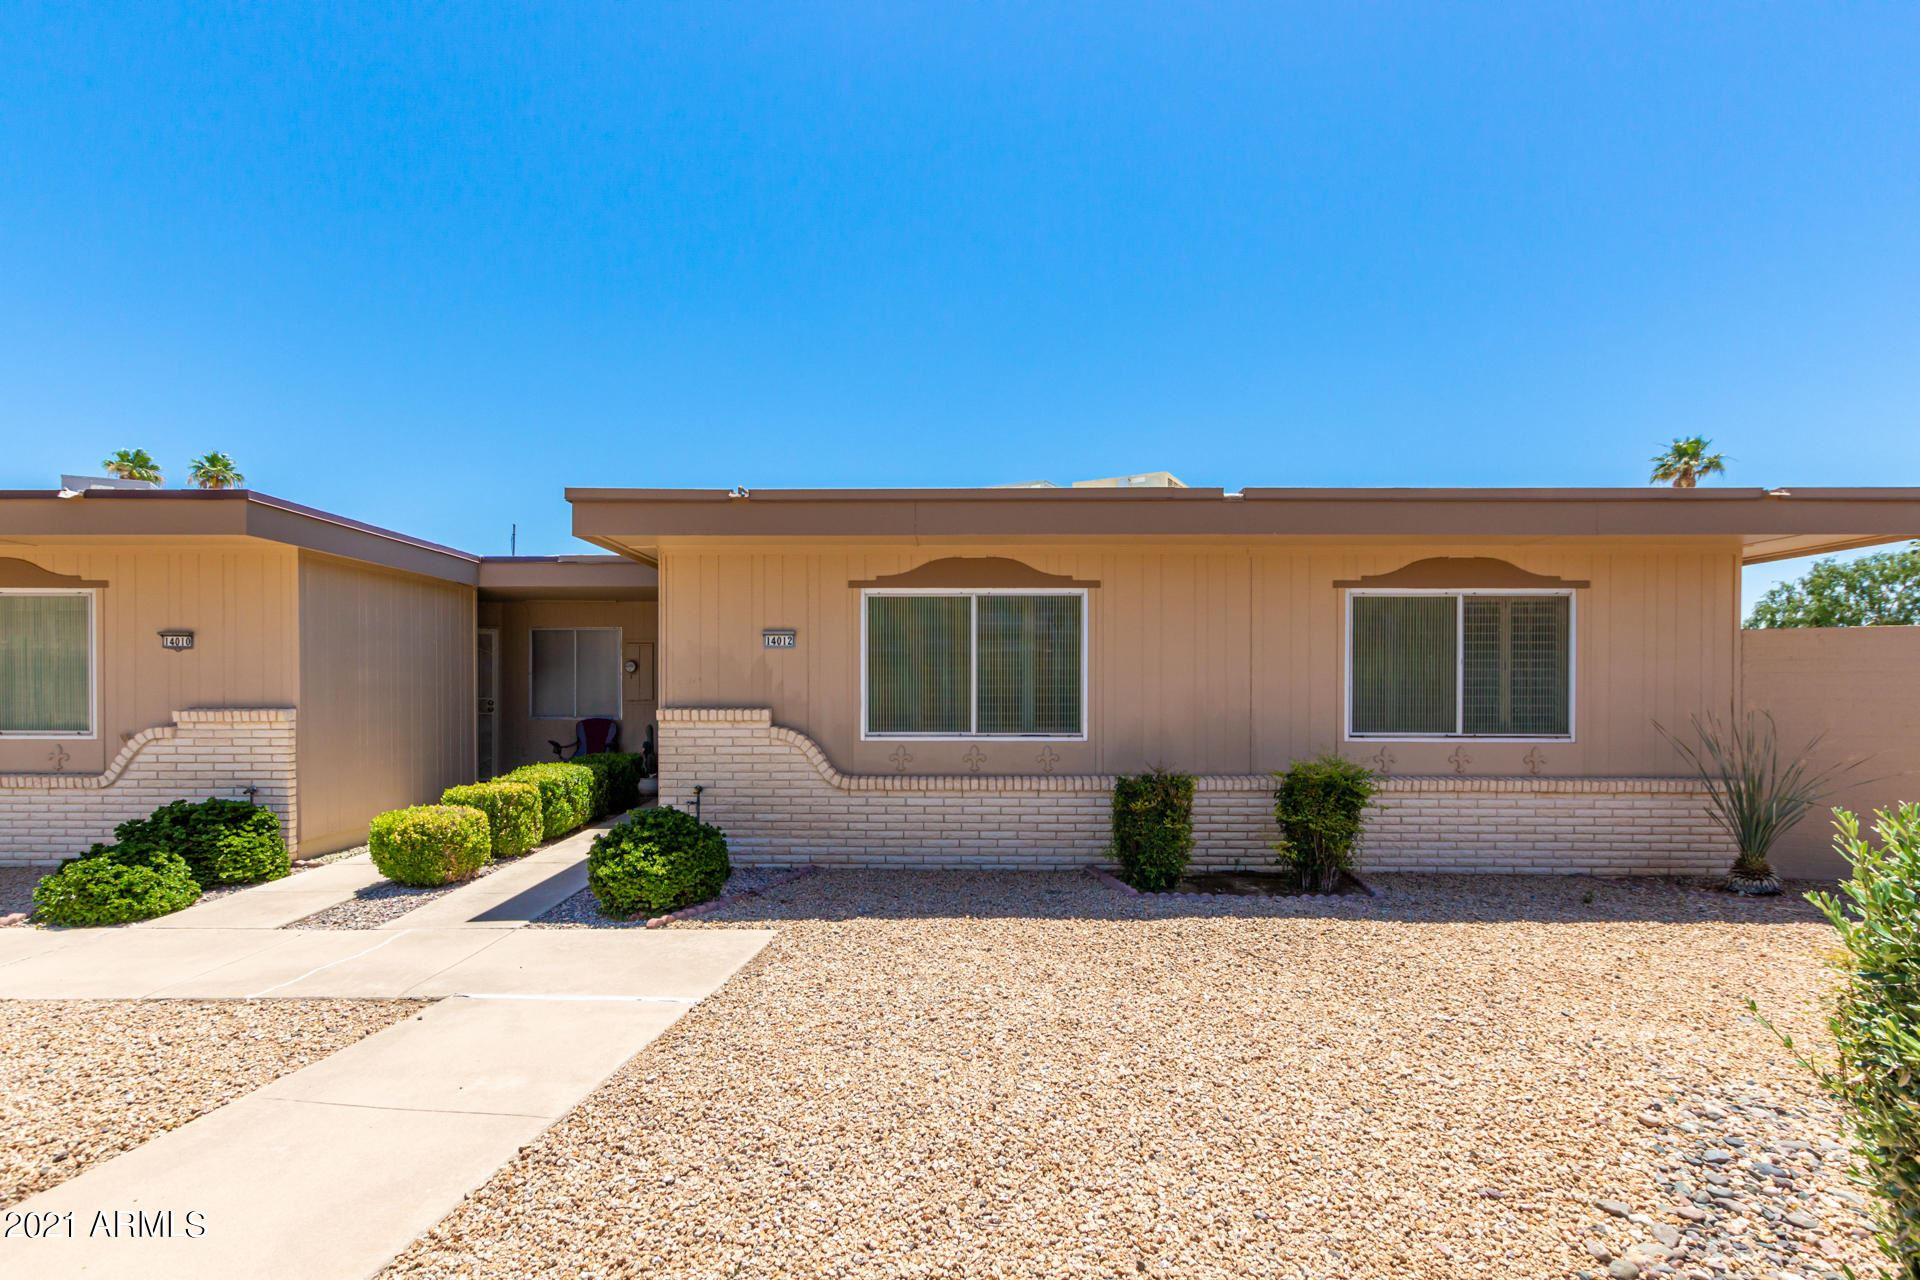 Photo of 14012 N PALM RIDGE Drive, Sun City, AZ 85351 (MLS # 6246393)